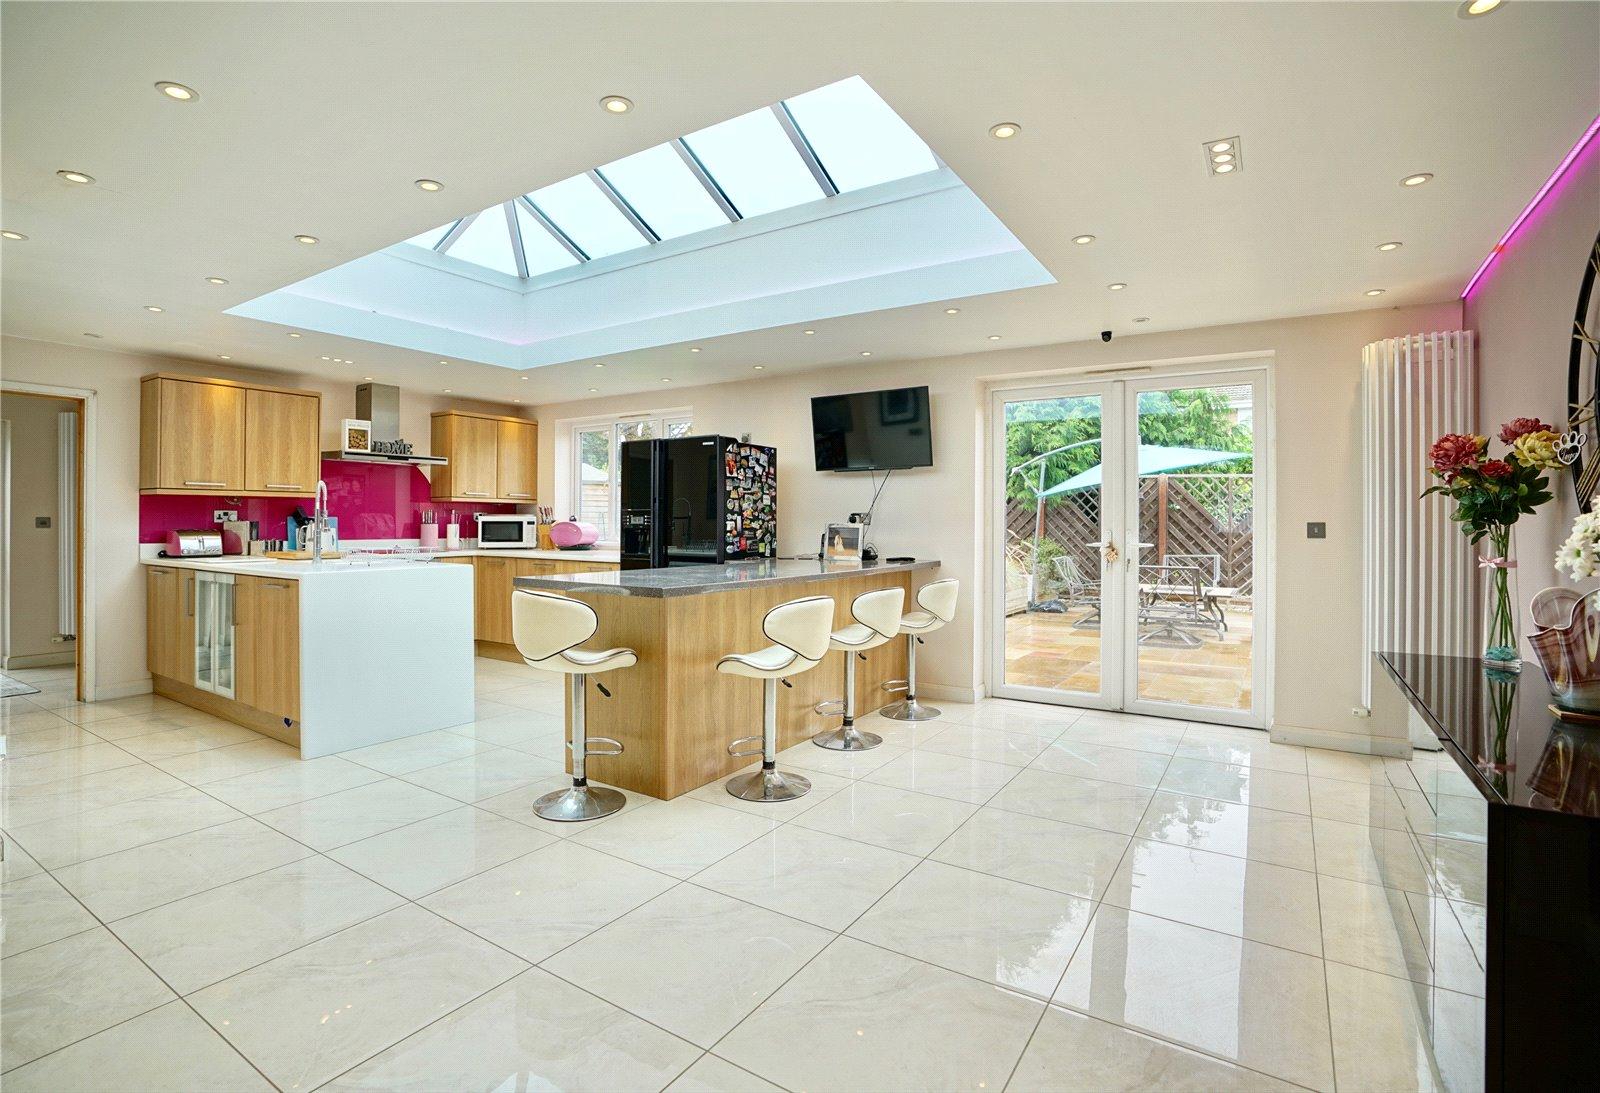 4 bed house for sale in Eaton Socon, PE19 8HU, PE19